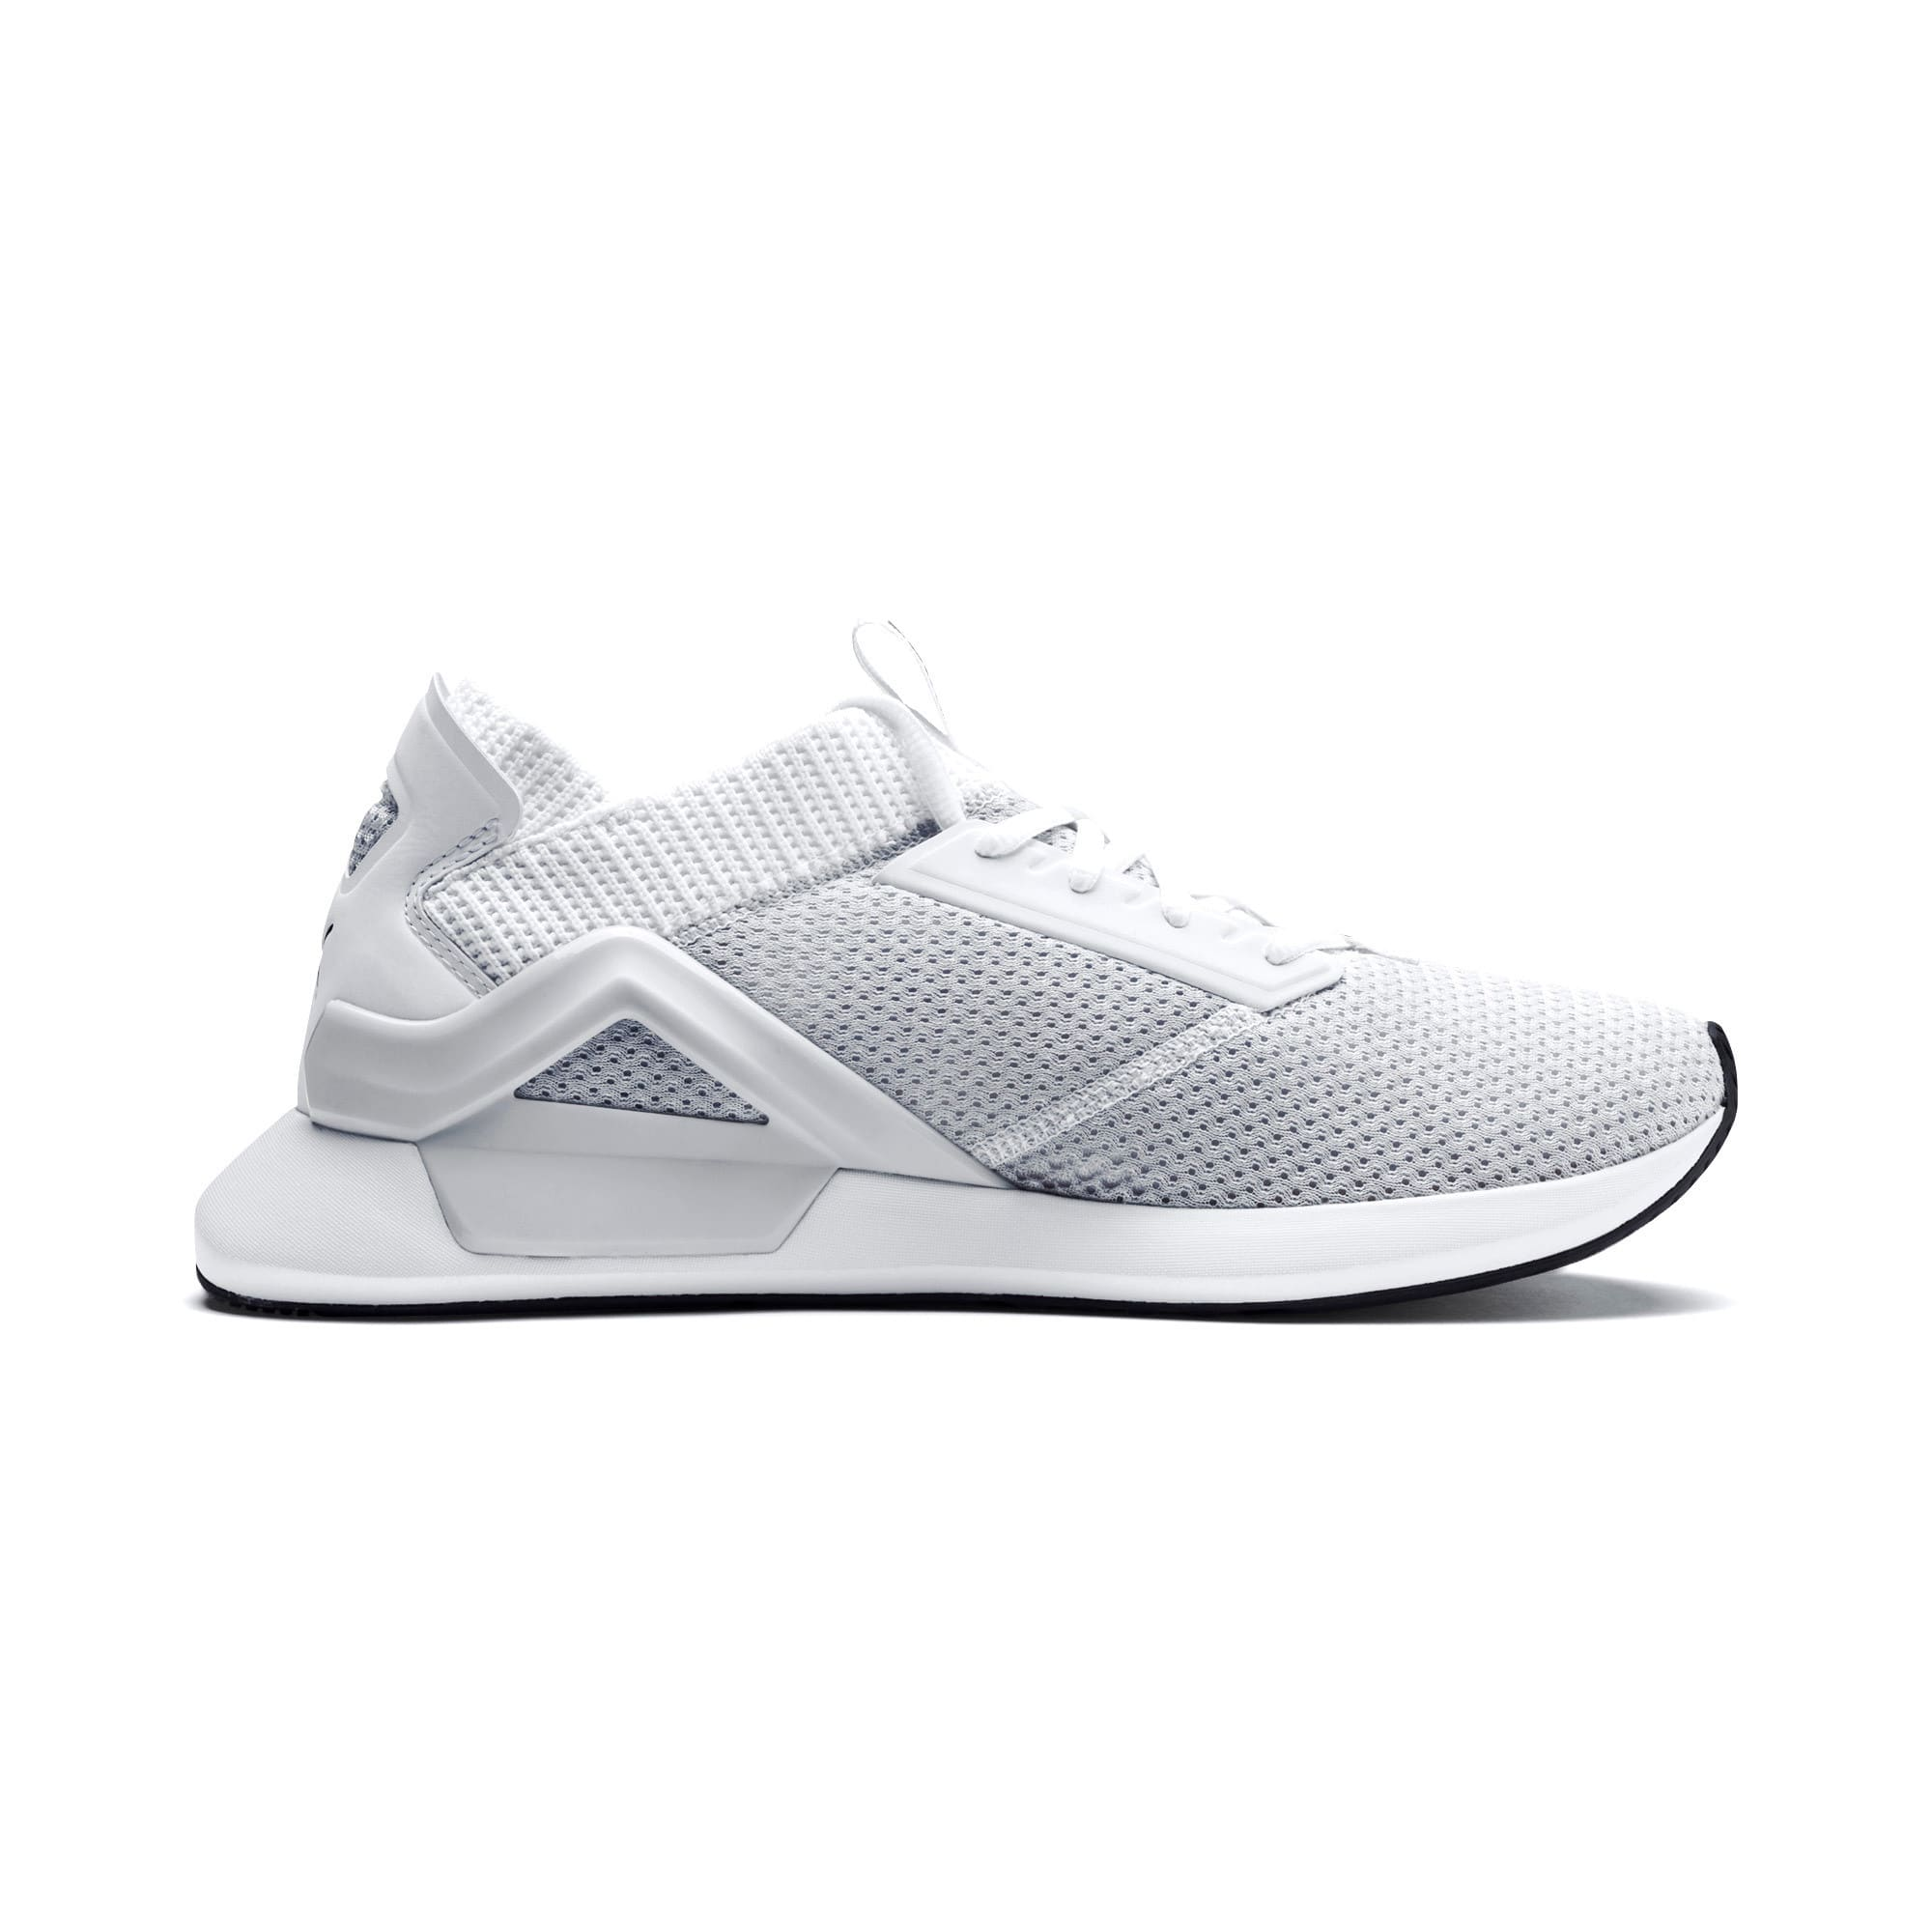 Thumbnail 5 of Rogue Men's Running Shoes, Puma White-Puma Black, medium